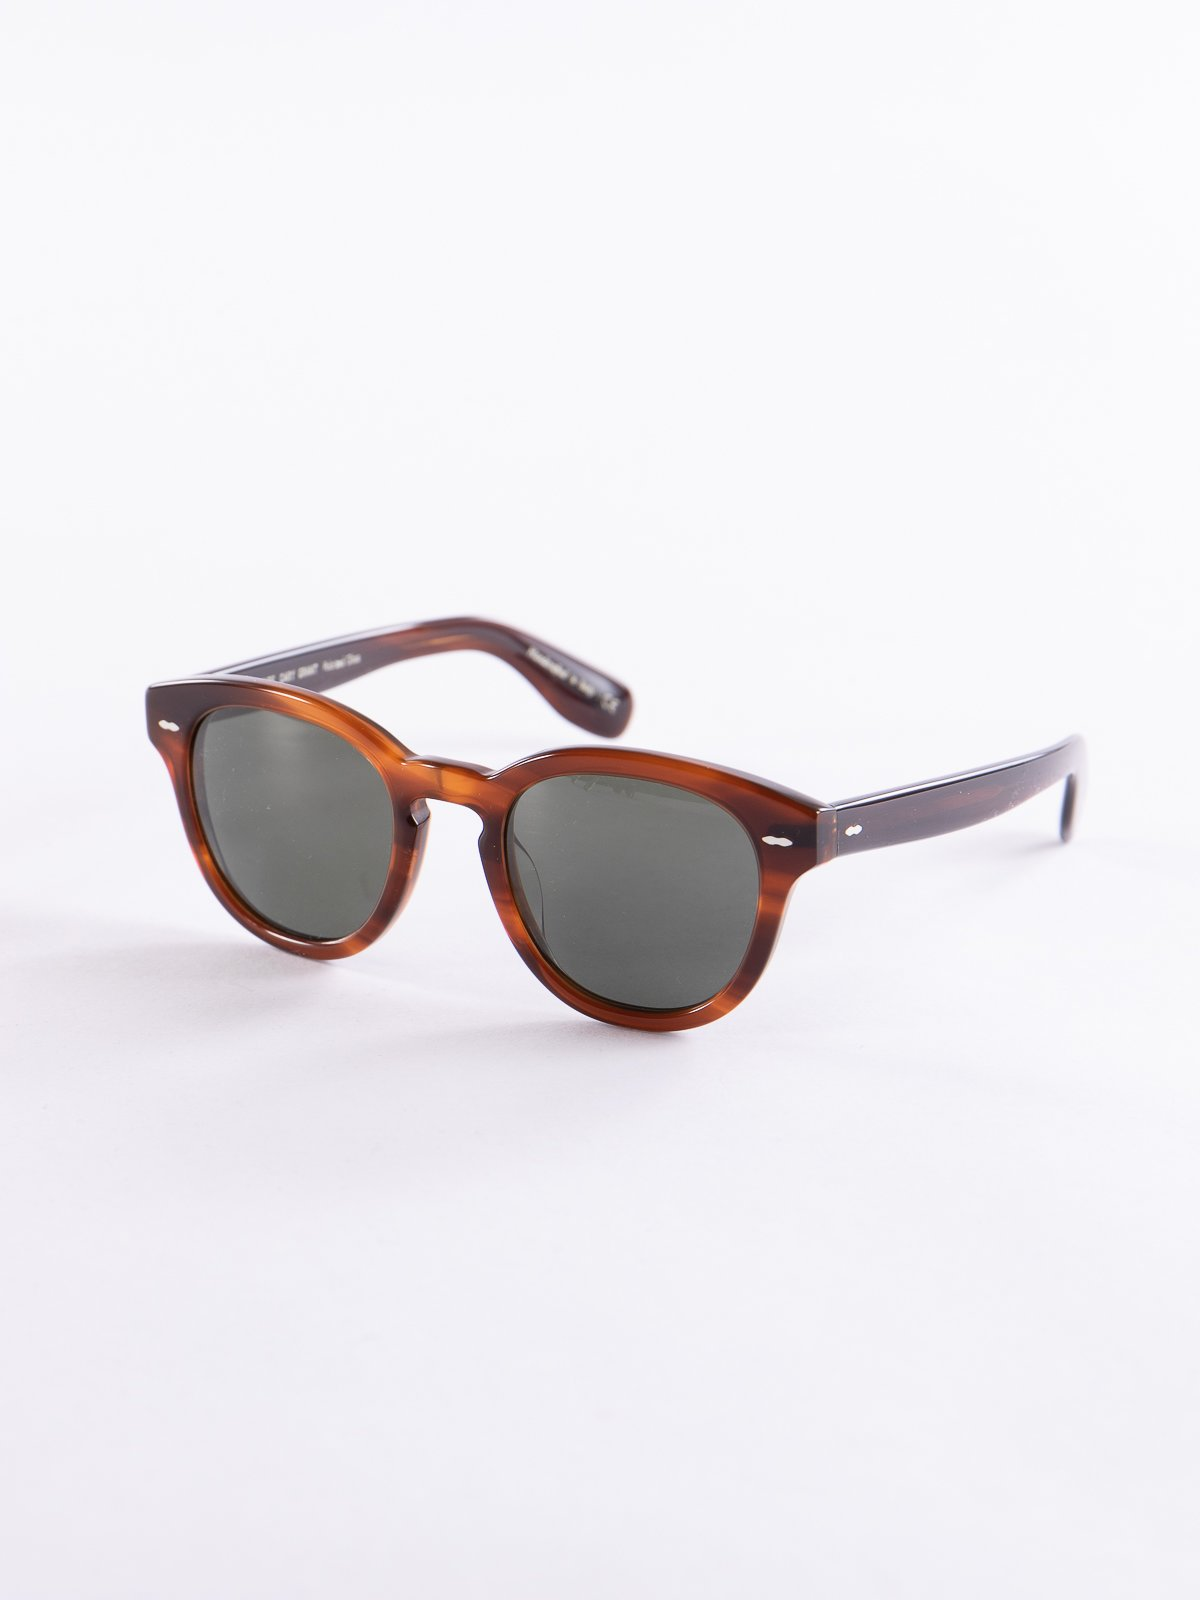 Grant Tortoise/G–15 Polar Cary Grant Sunglasses - Image 3